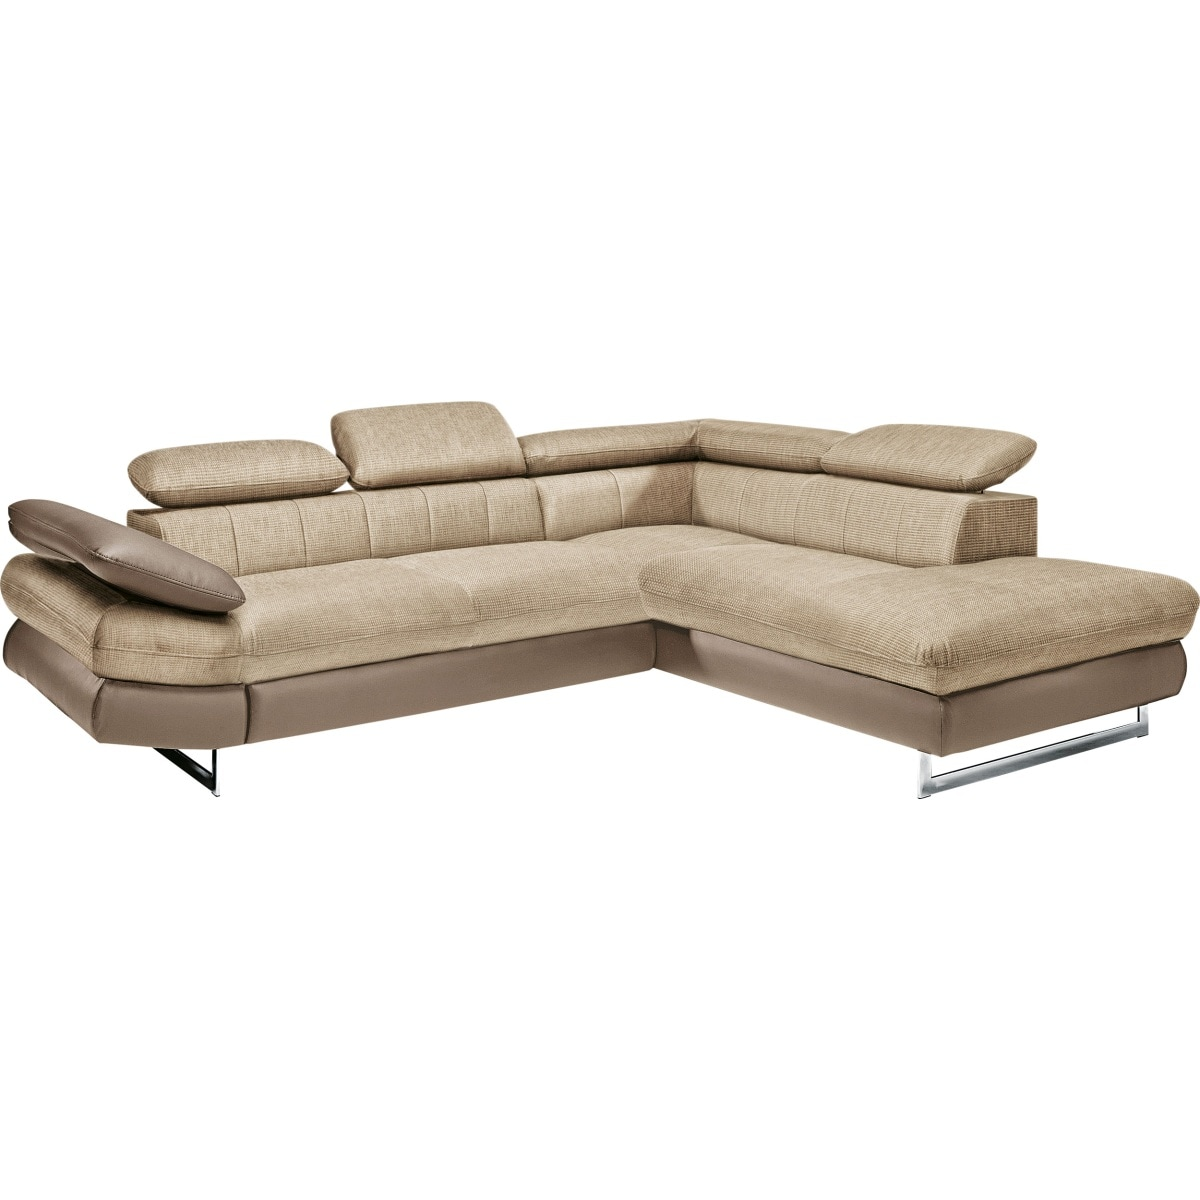 polsterecke beige braun eckgarnituren polsterm bel. Black Bedroom Furniture Sets. Home Design Ideas